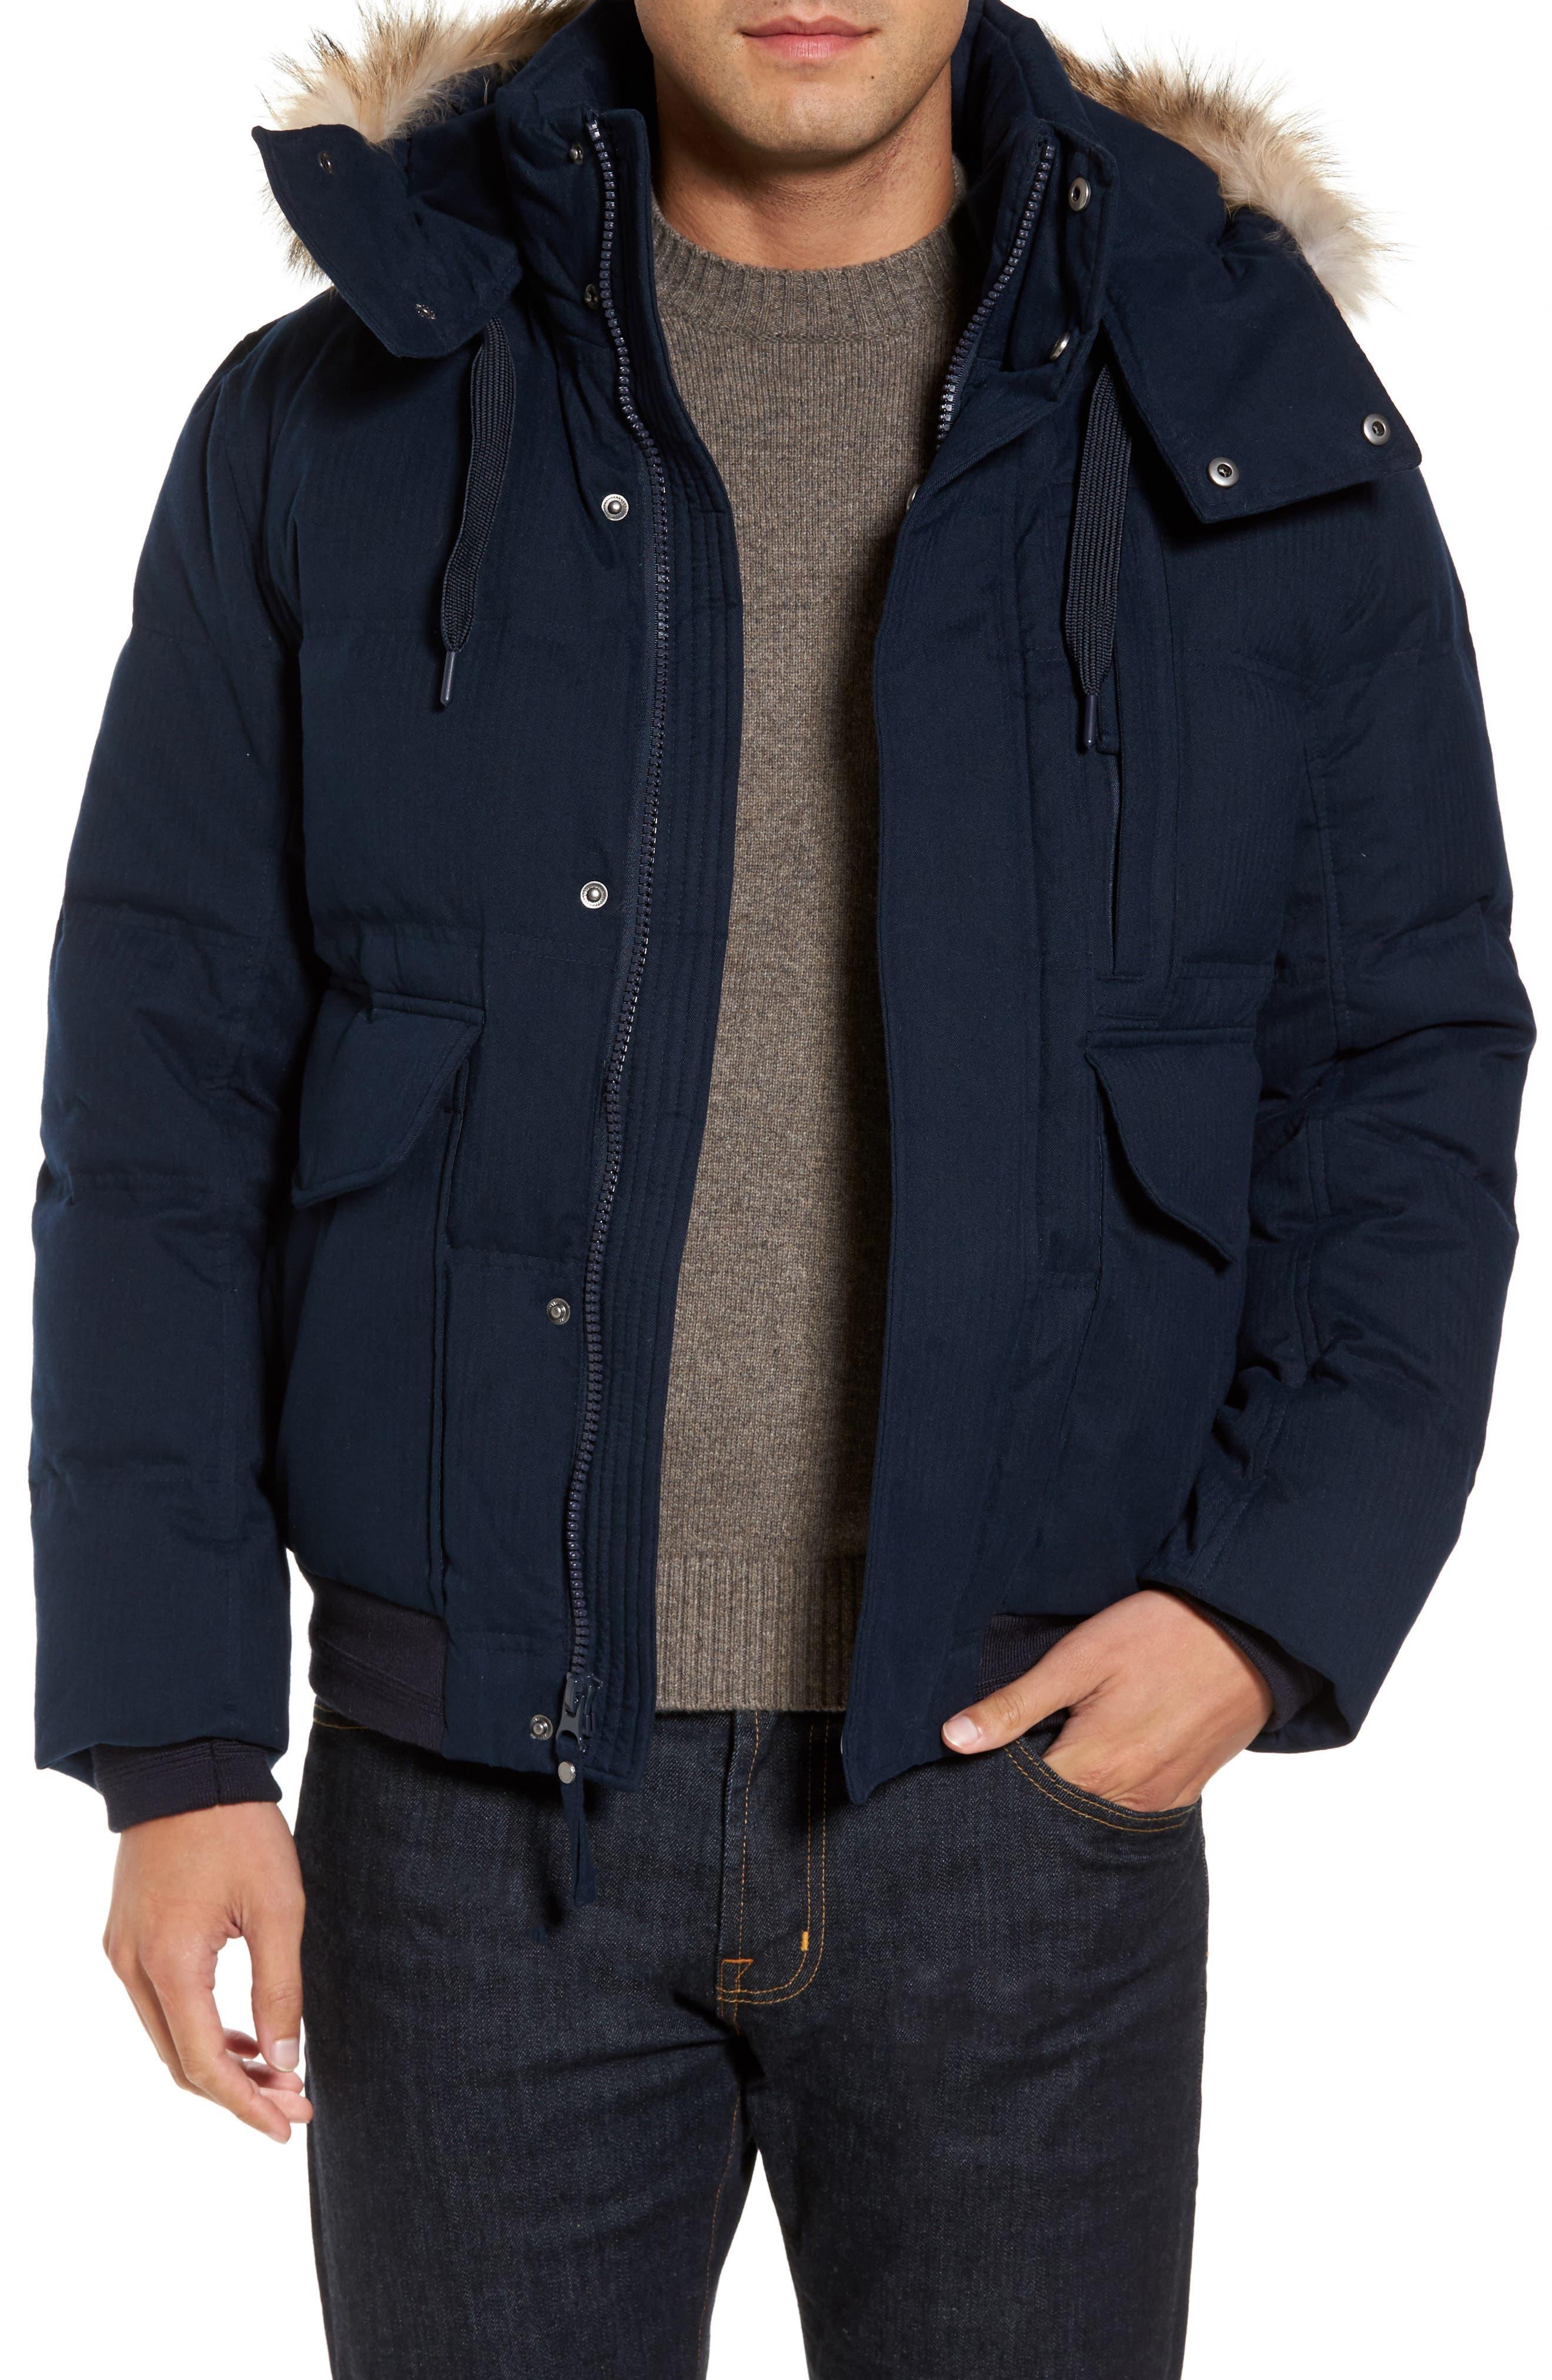 Men's Clothing Andrew Marc New York Men Size M Pilot Jacket Faux Lining Fur Black